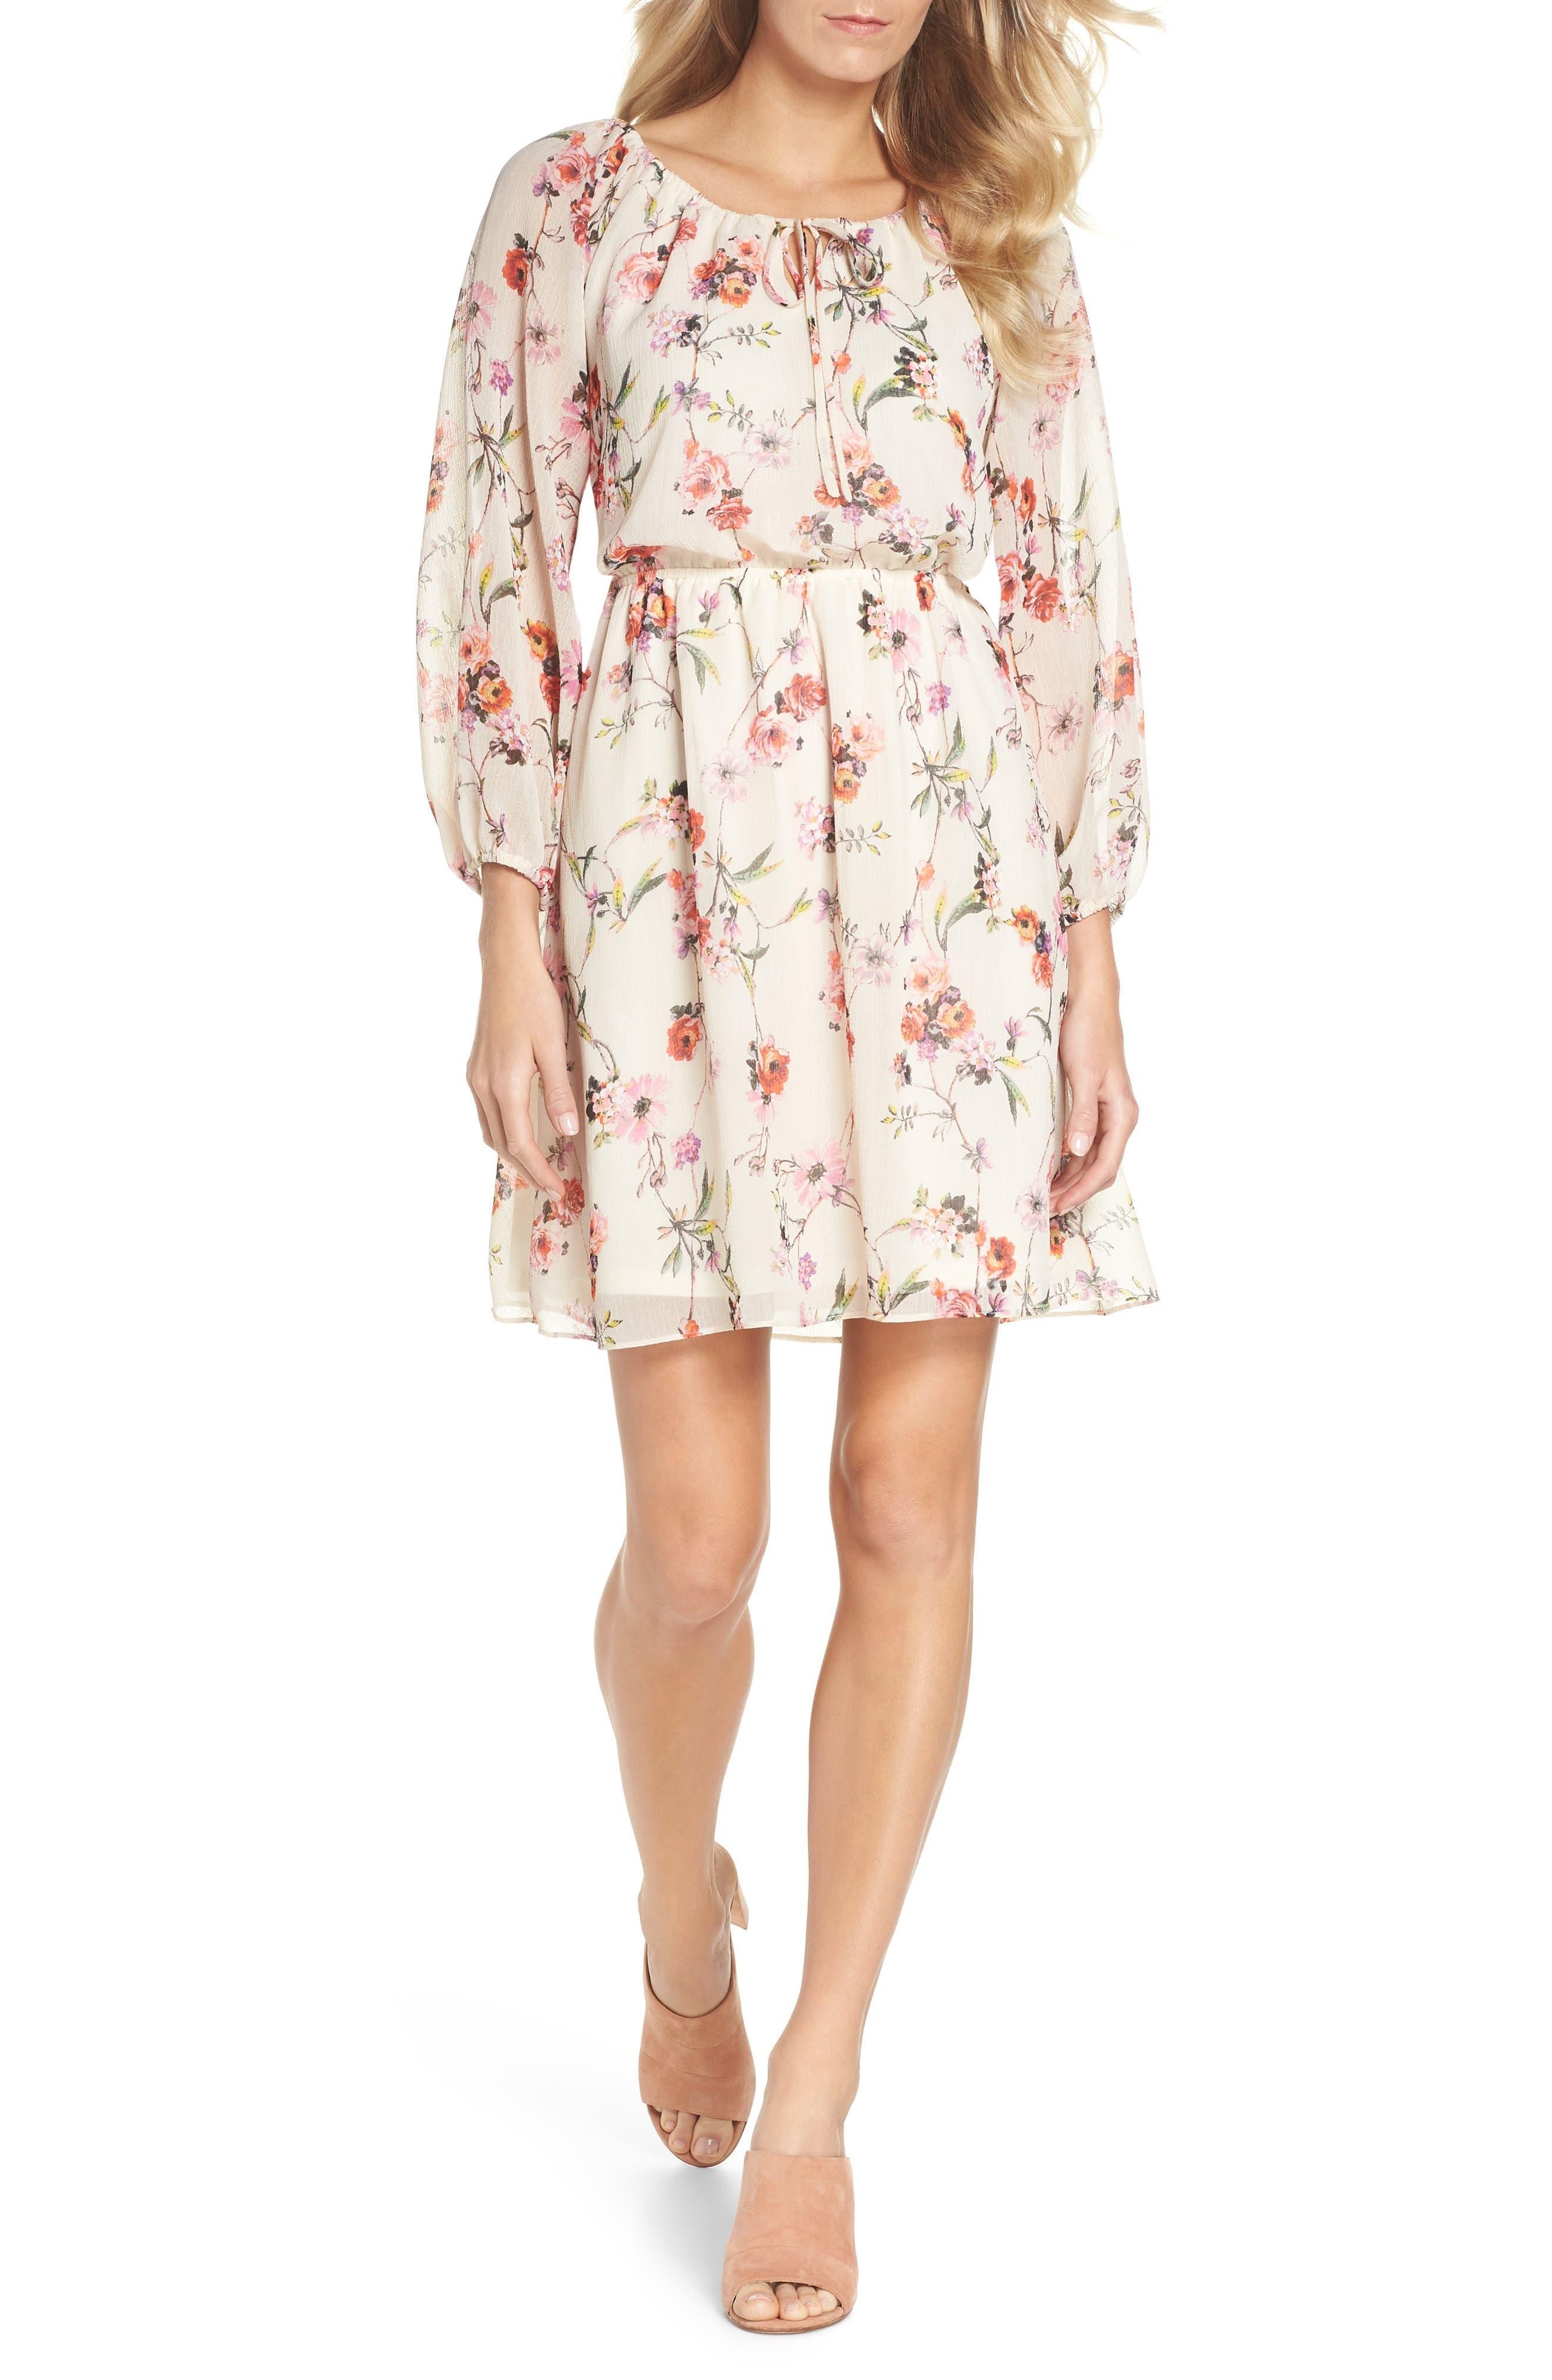 Adrianna Papell Bonita Oasis Floral Dress